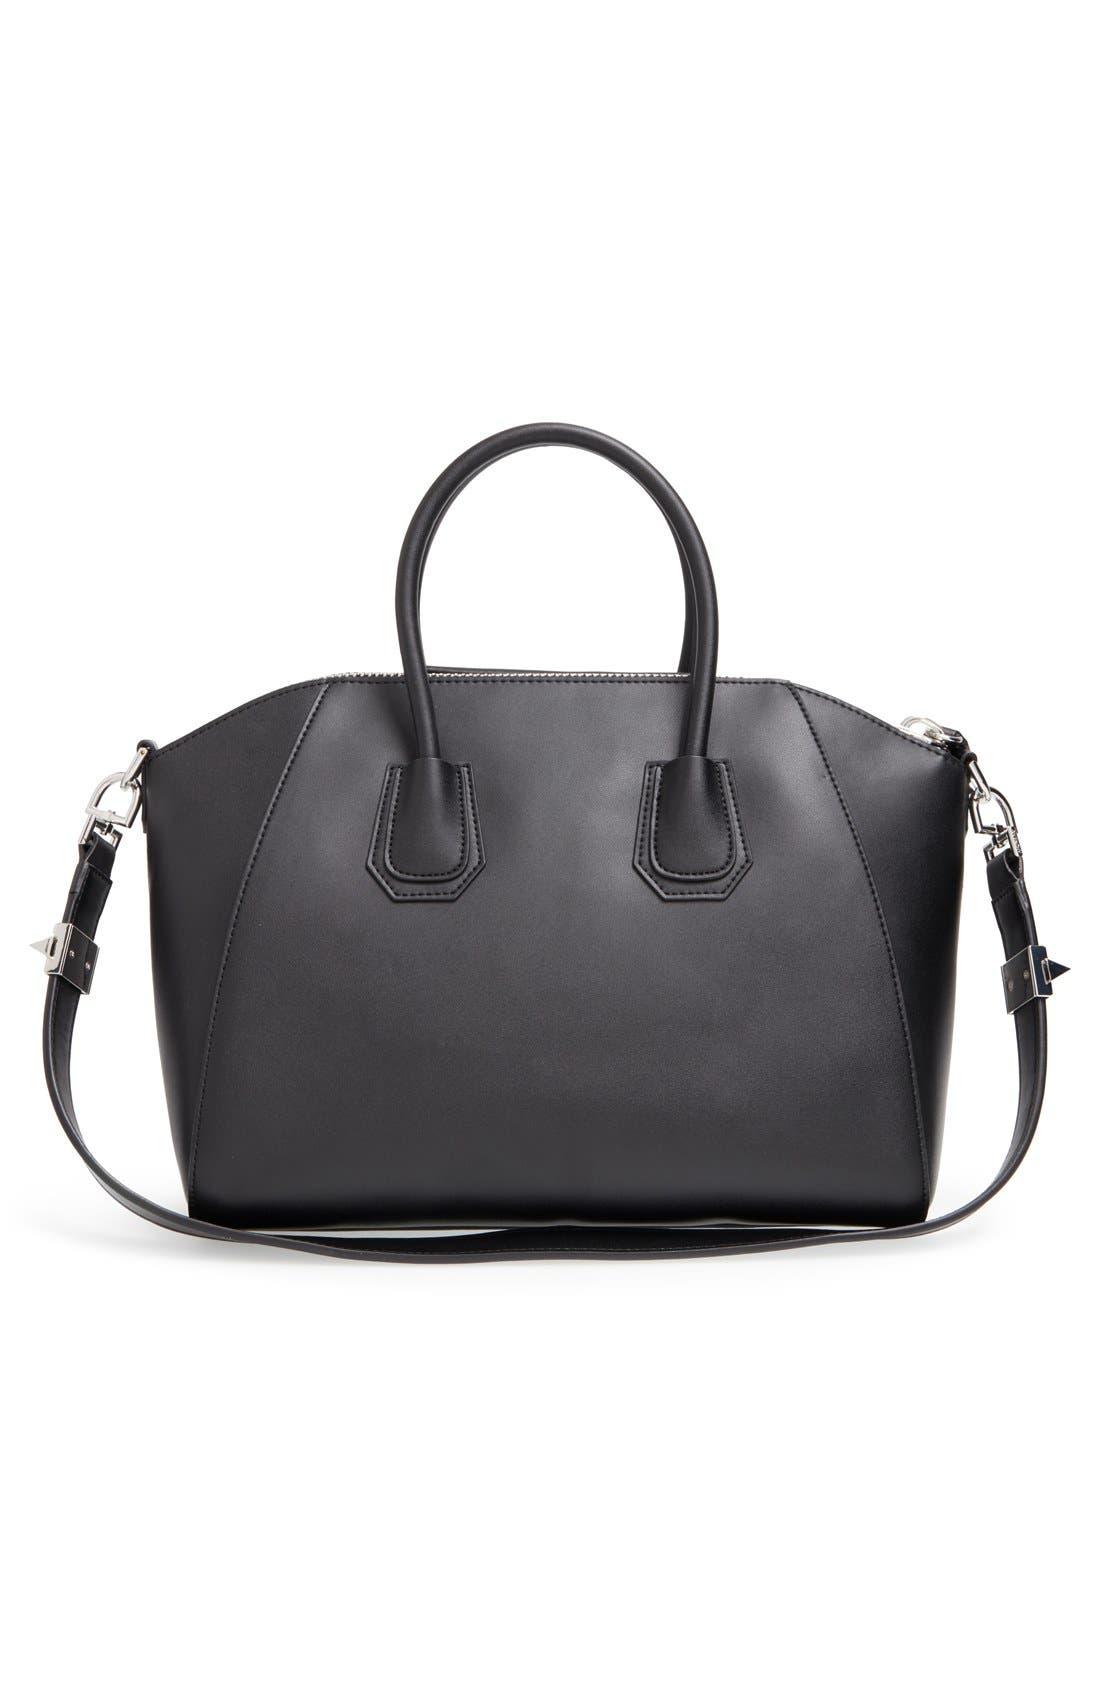 'Medium Antigona' Leather Satchel,                             Alternate thumbnail 3, color,                             Black